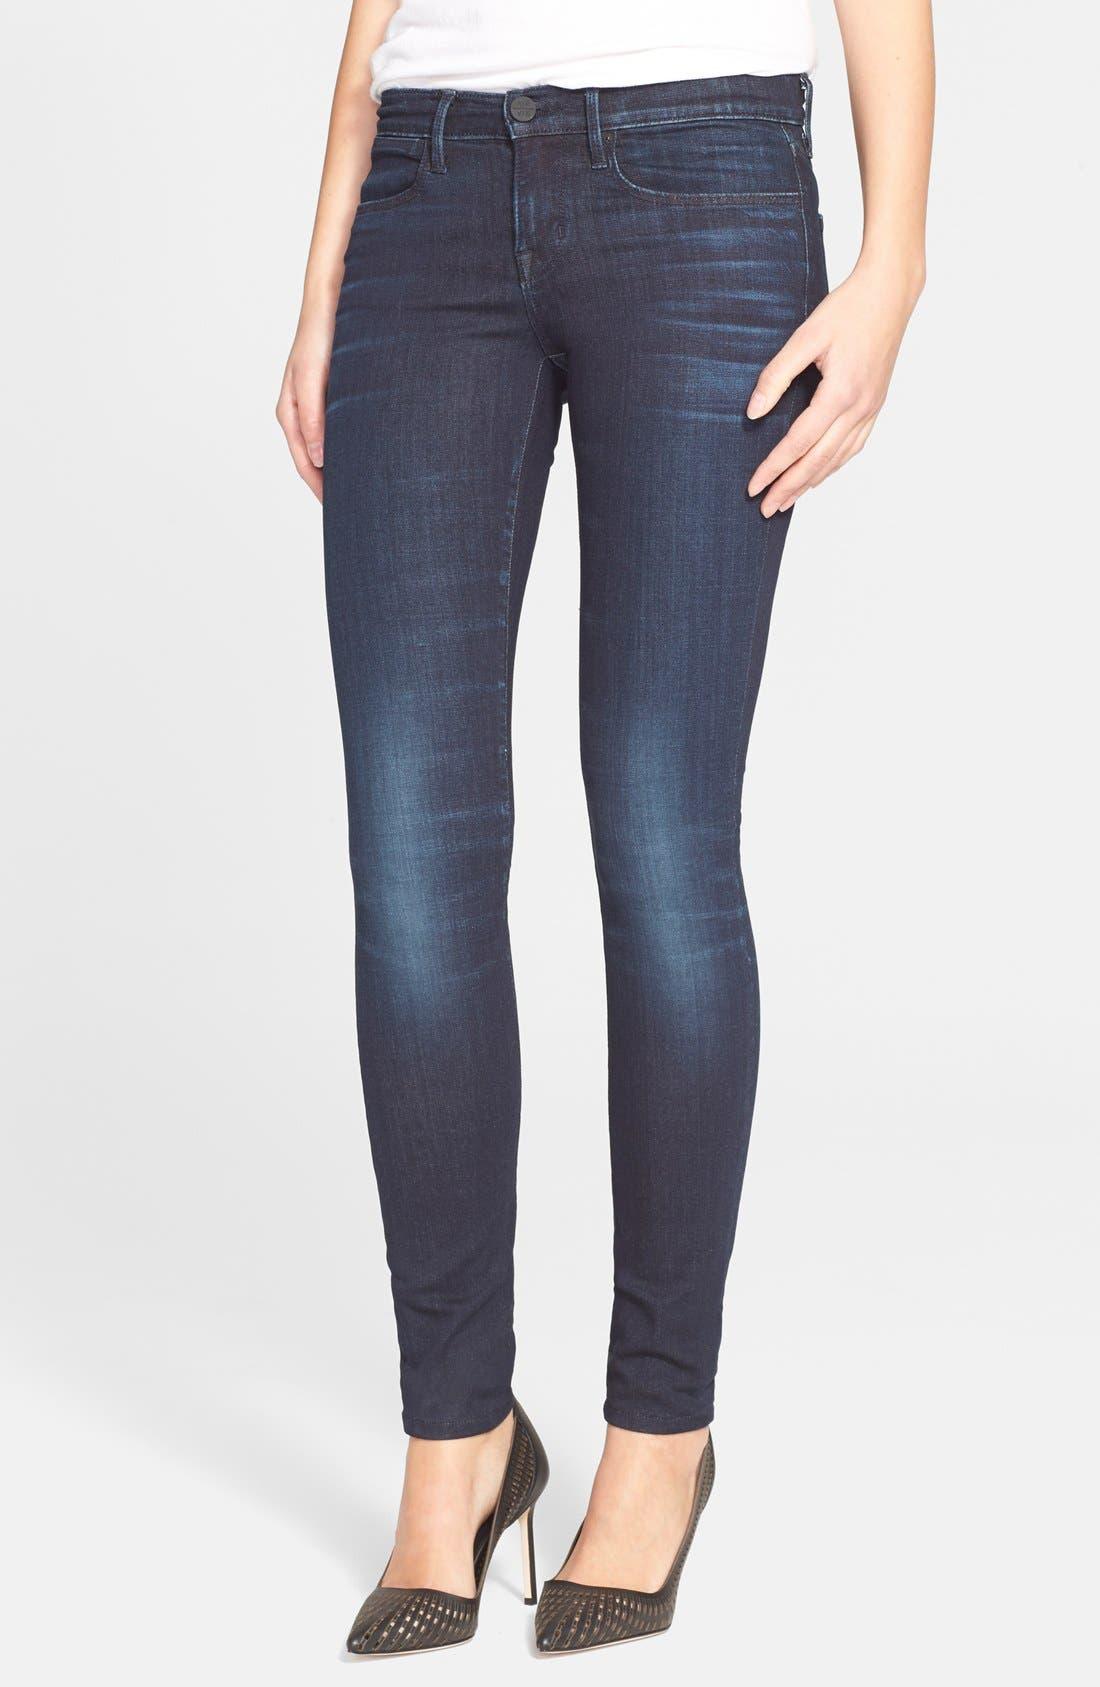 AYR 'The Skinny' Skinny Jeans